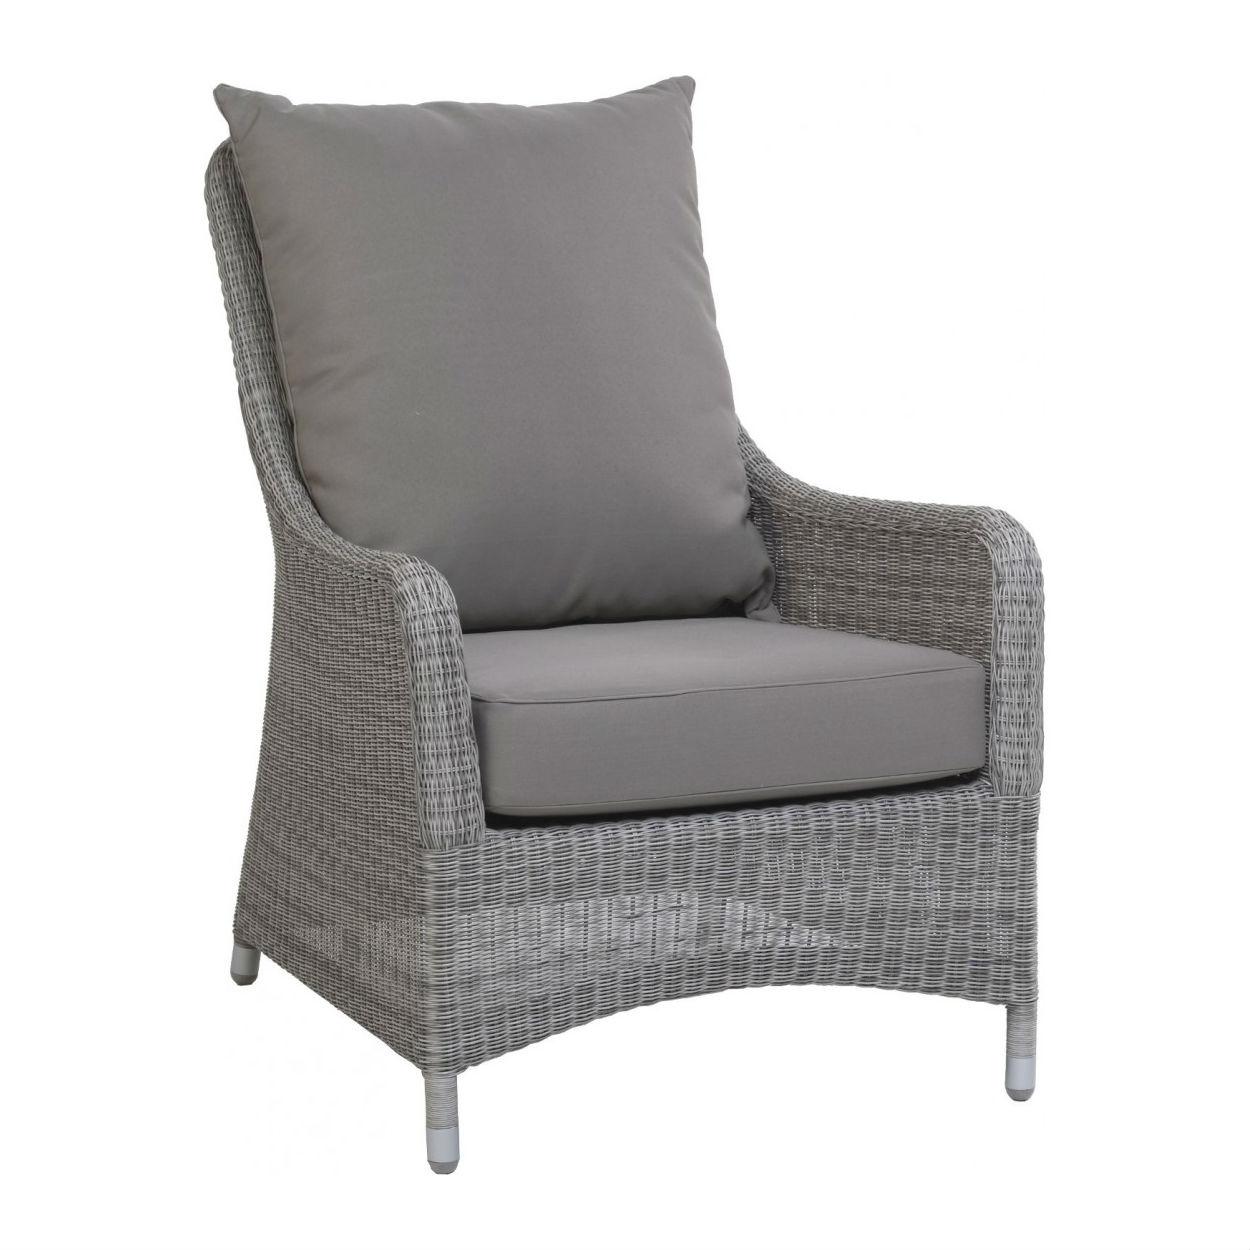 fauteuil de jardin confortable en resine tressee